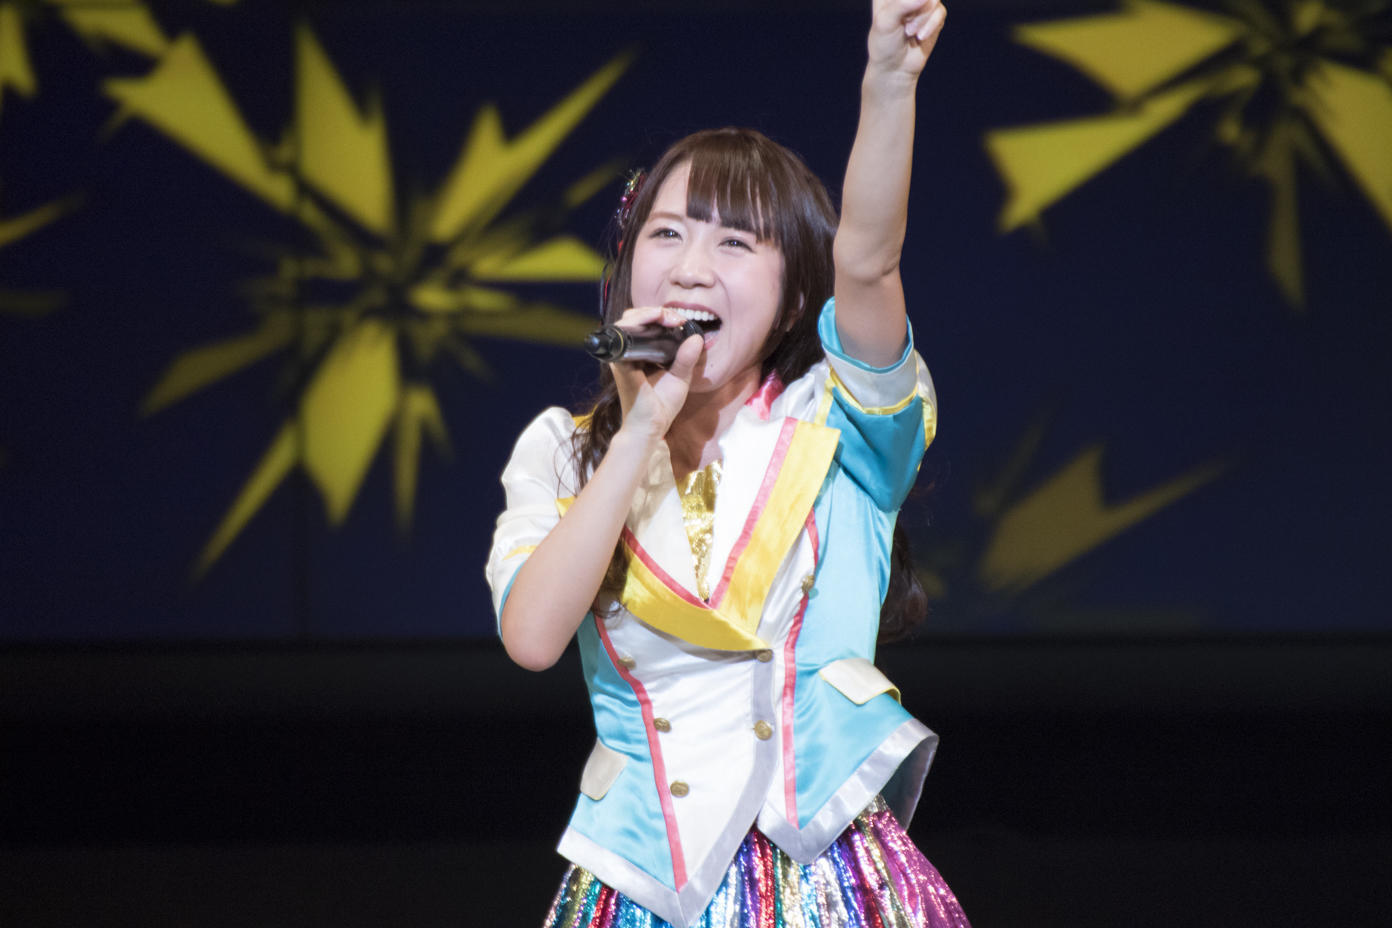 http://news.yoshimoto.co.jp/20161228143752-bcd31f4e45931fba8f0083ba5bd5b1d9faa434a5.jpg